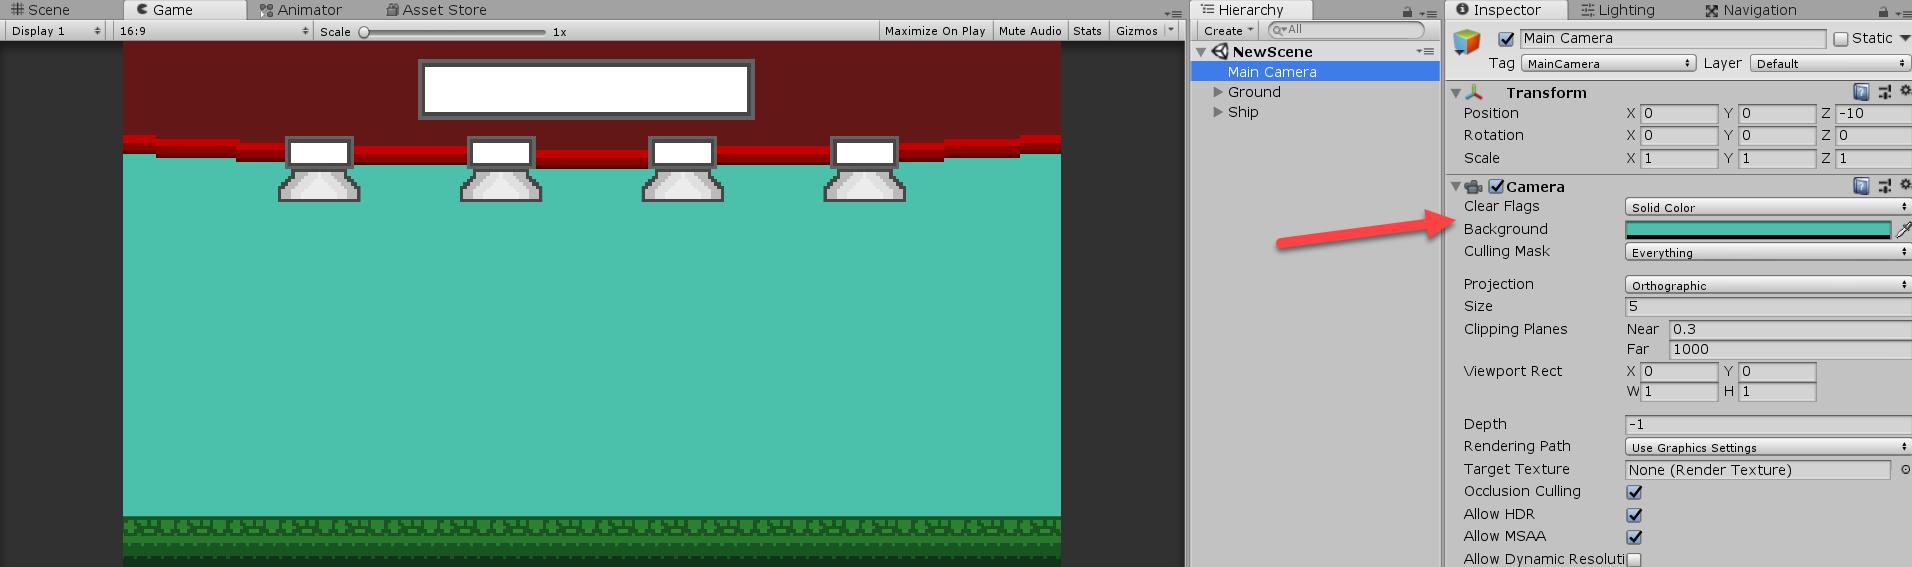 Unity Main Camera background adjusted to aqua